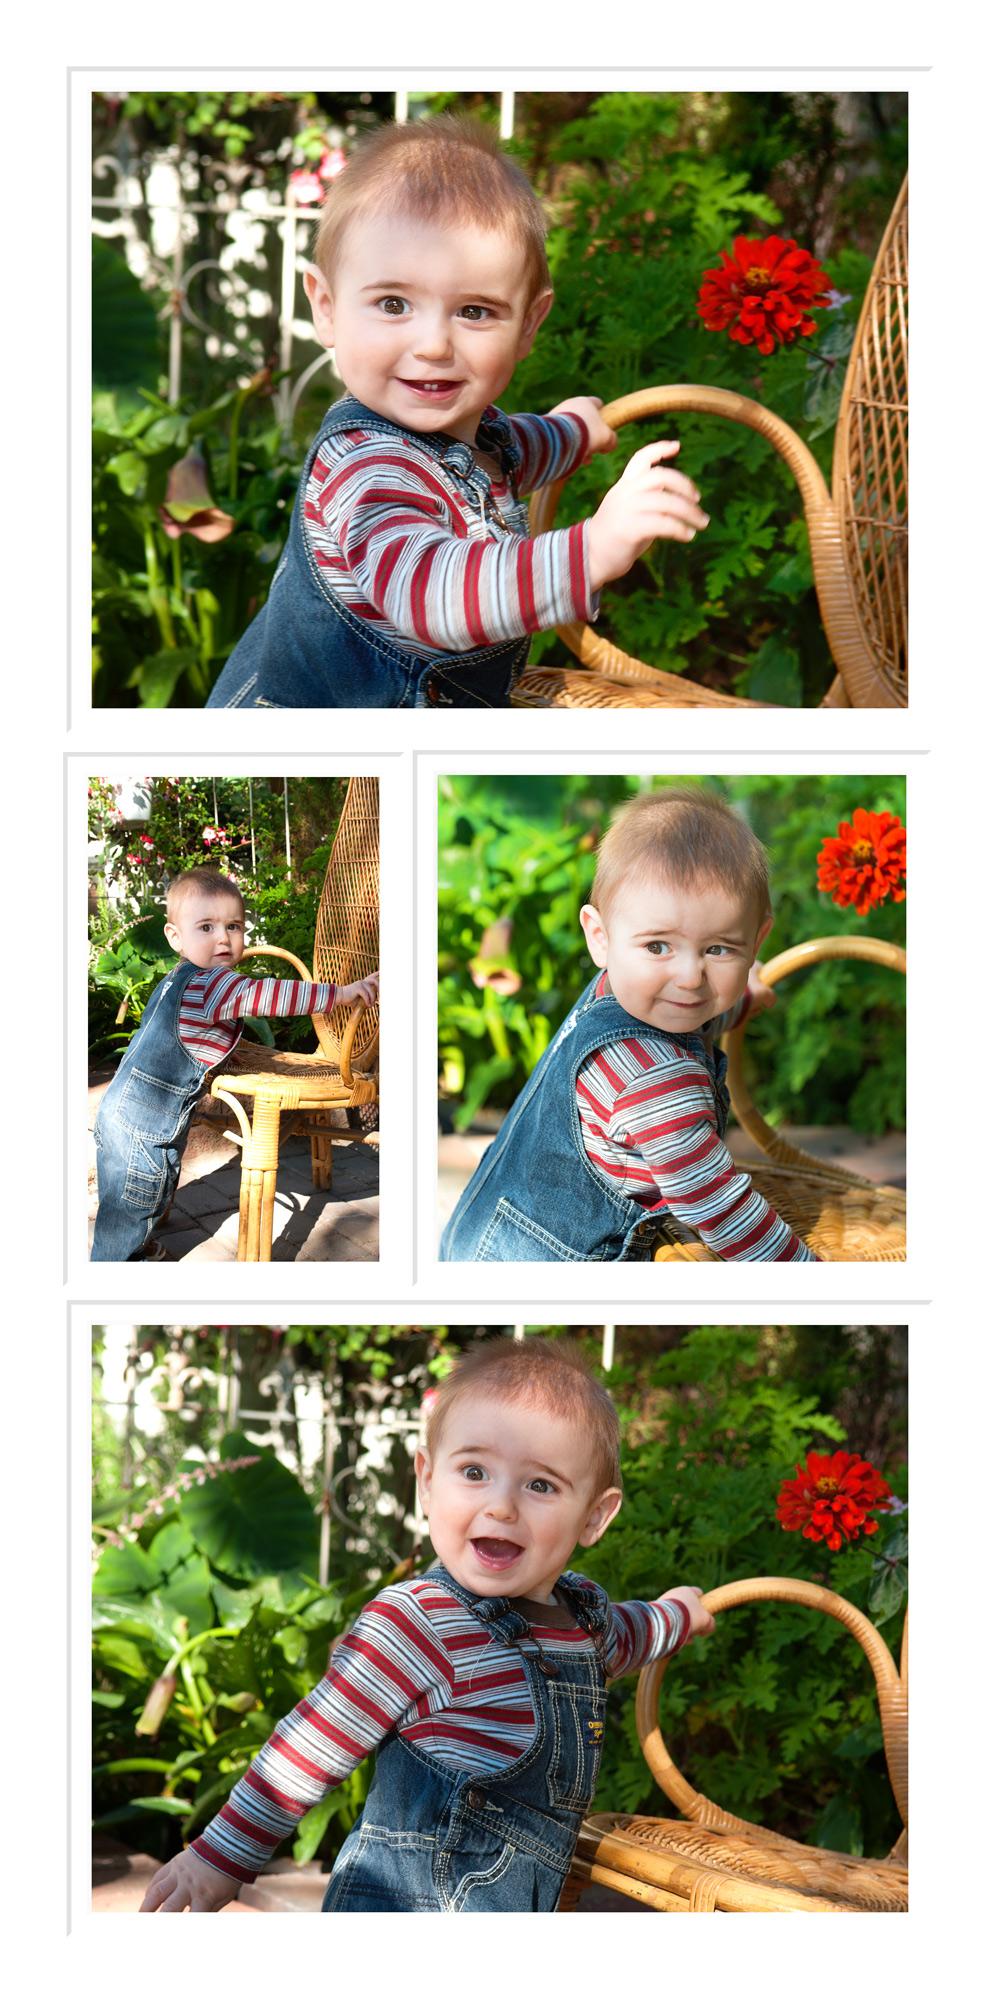 free-lense-photo-cutest-baby.jpg